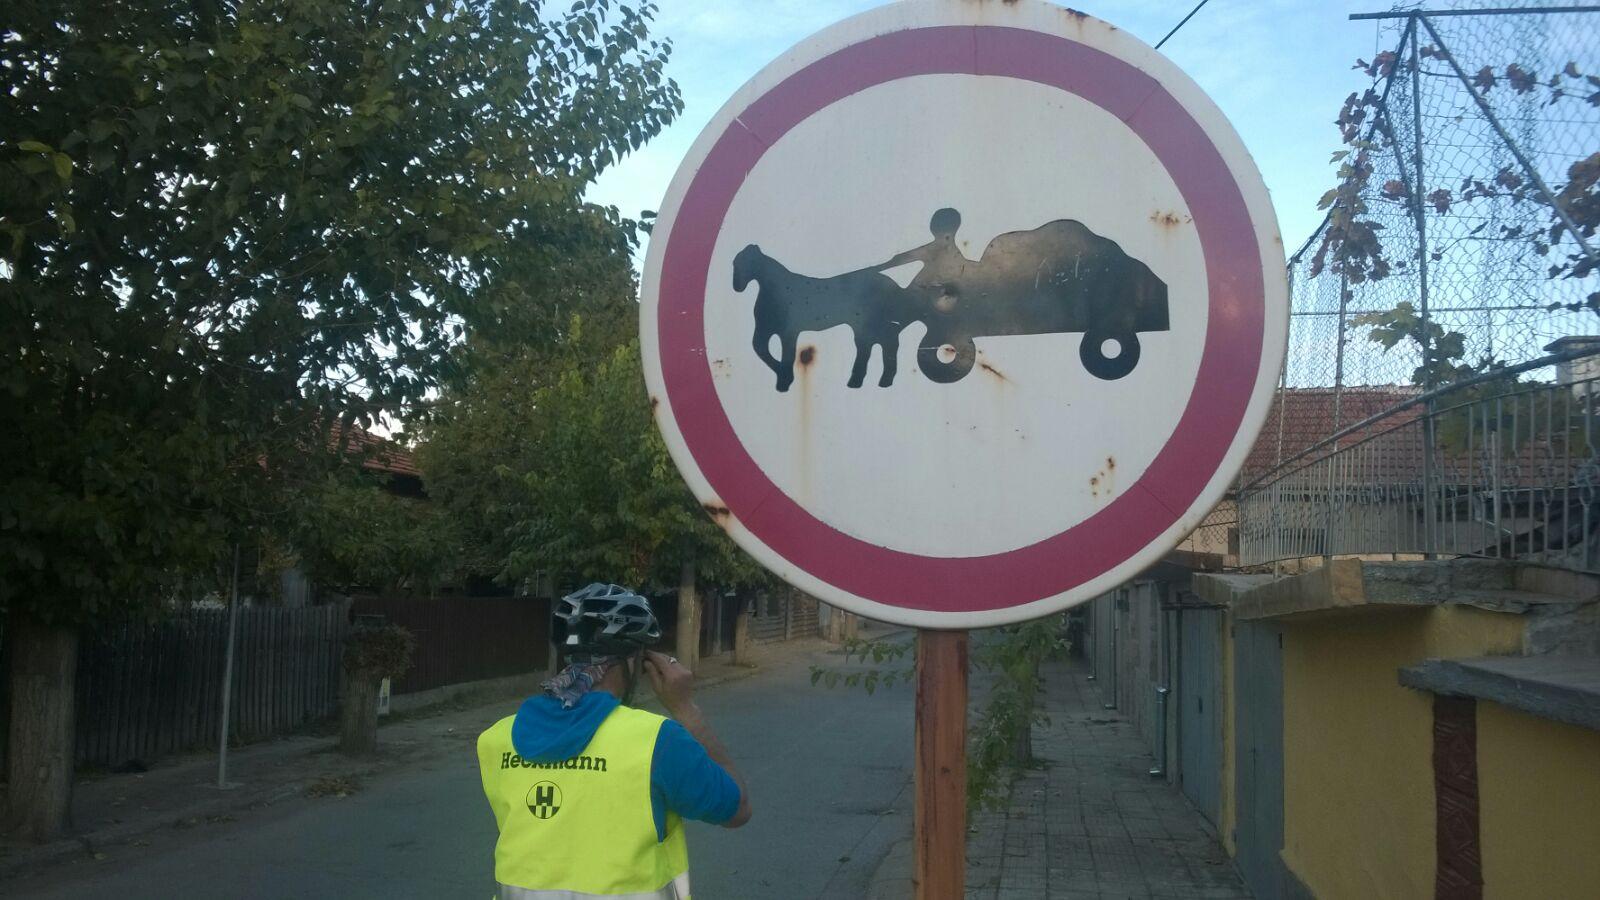 Fuhrwerke verboten ...